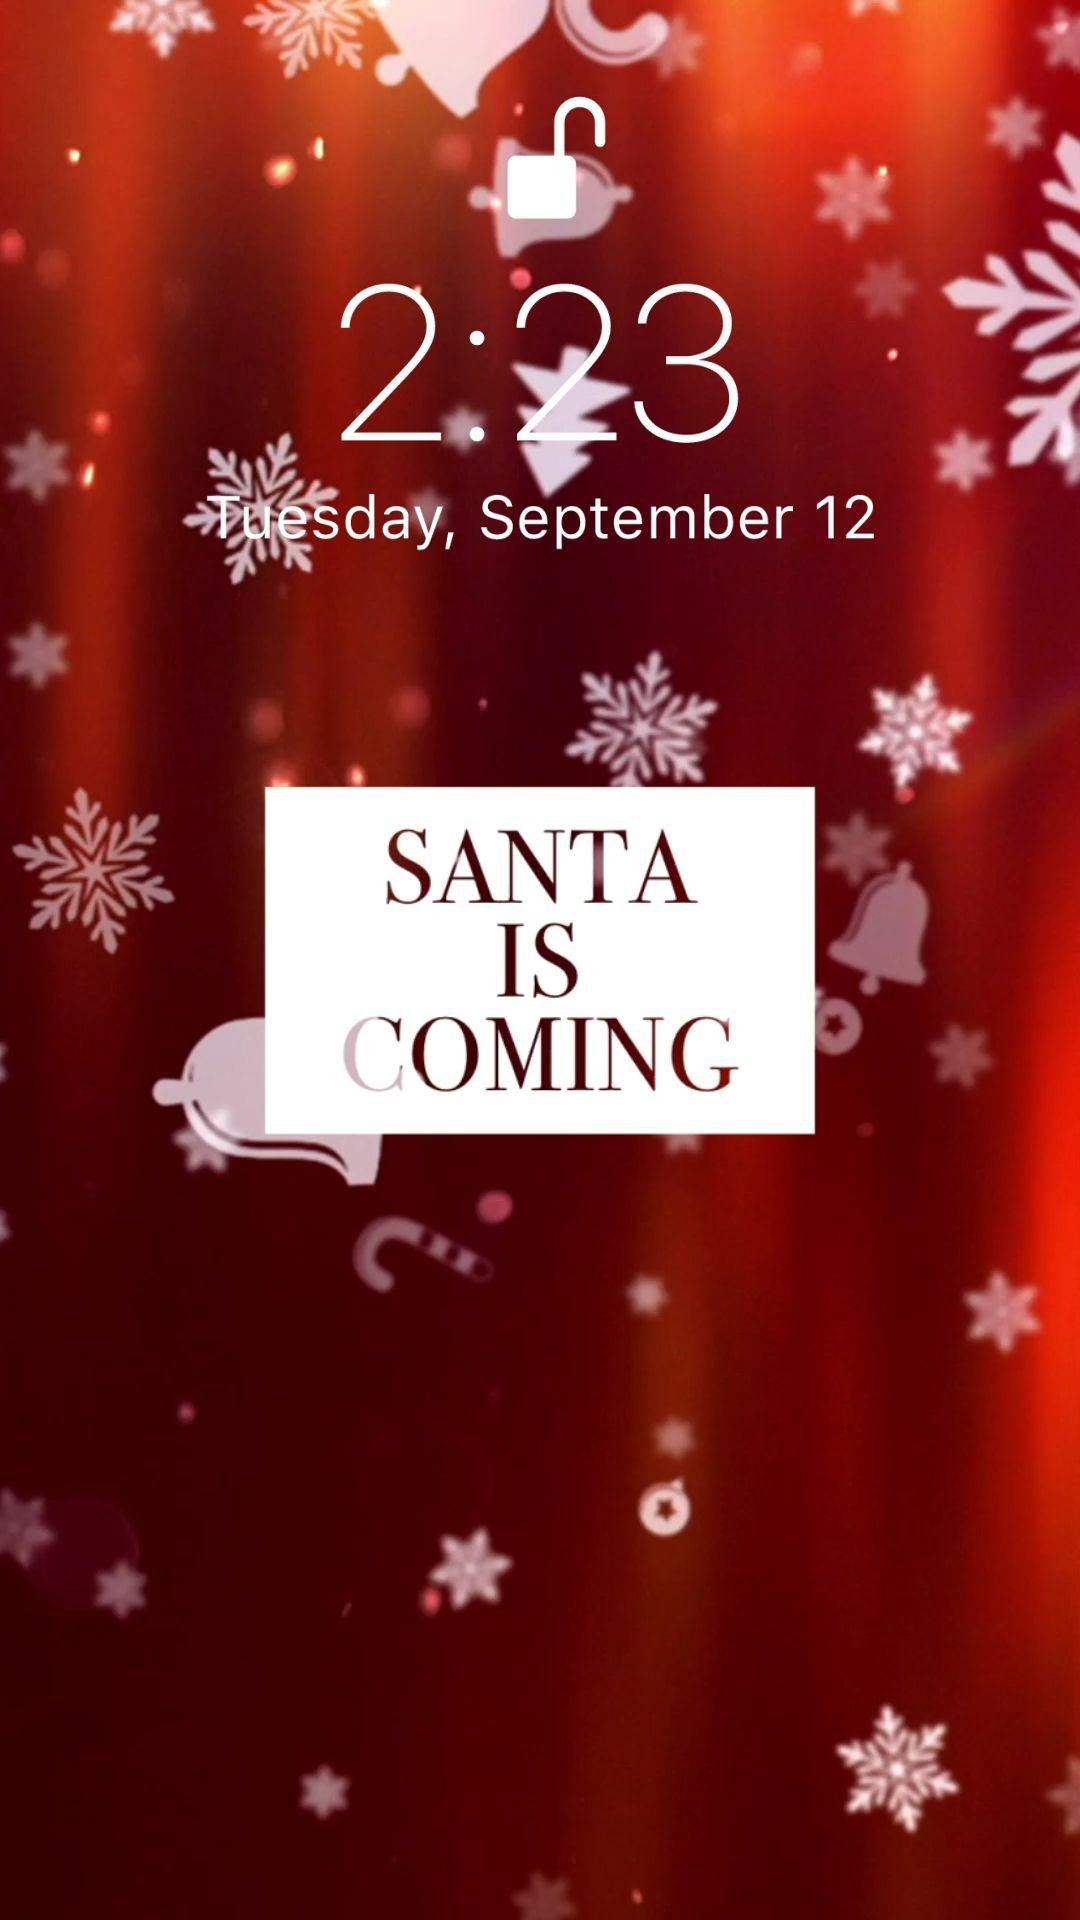 Santa is coming��